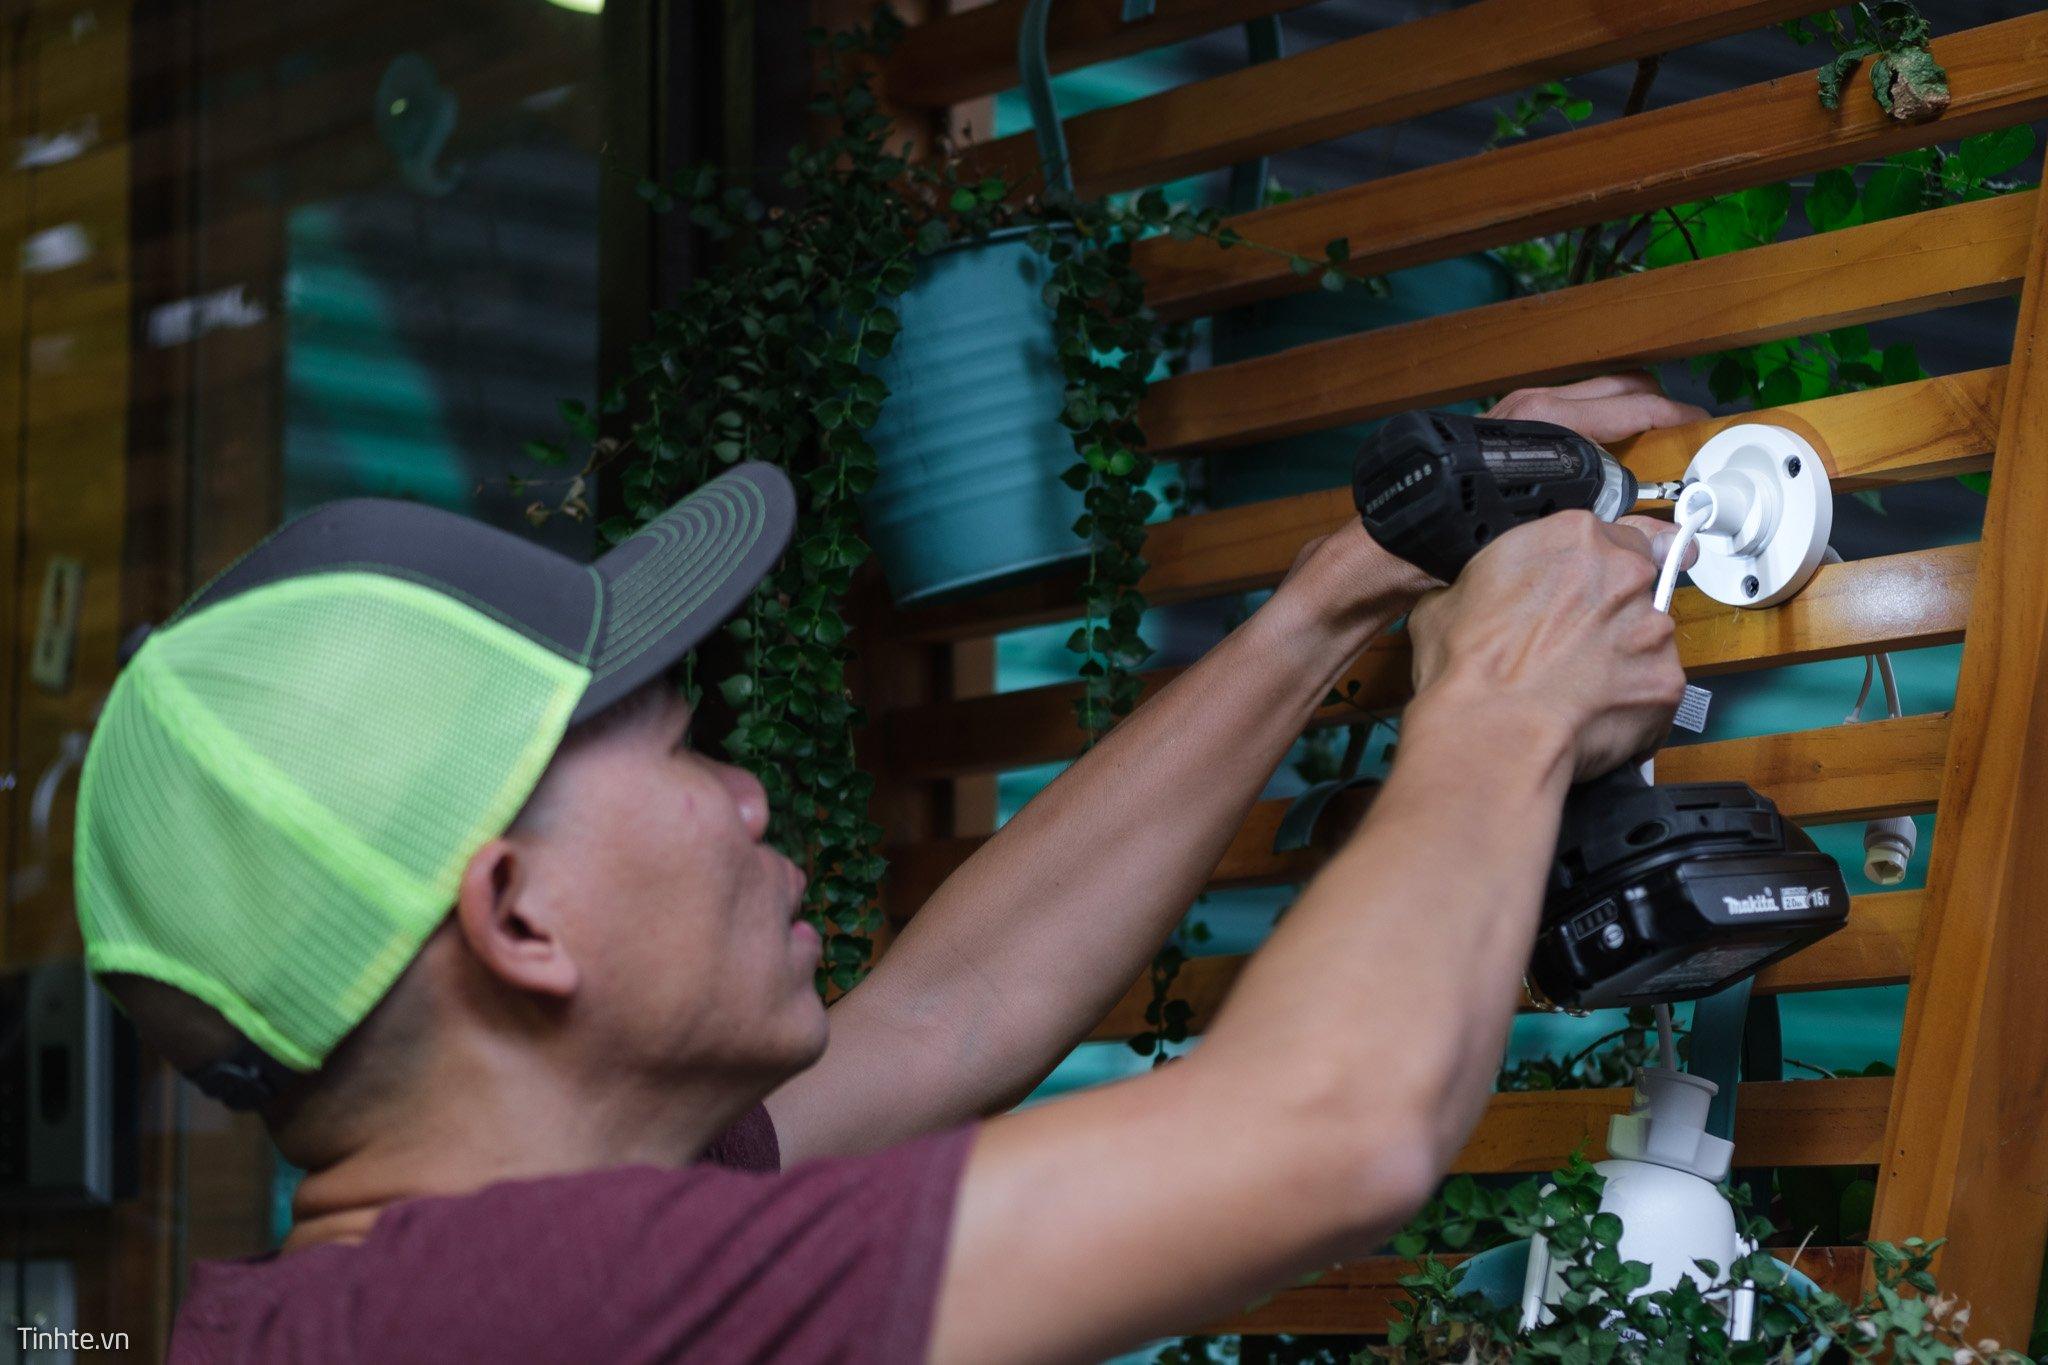 tren-tay-camera-an-ninh-Imoulife-bullet-2c-tinhte-7.jpg